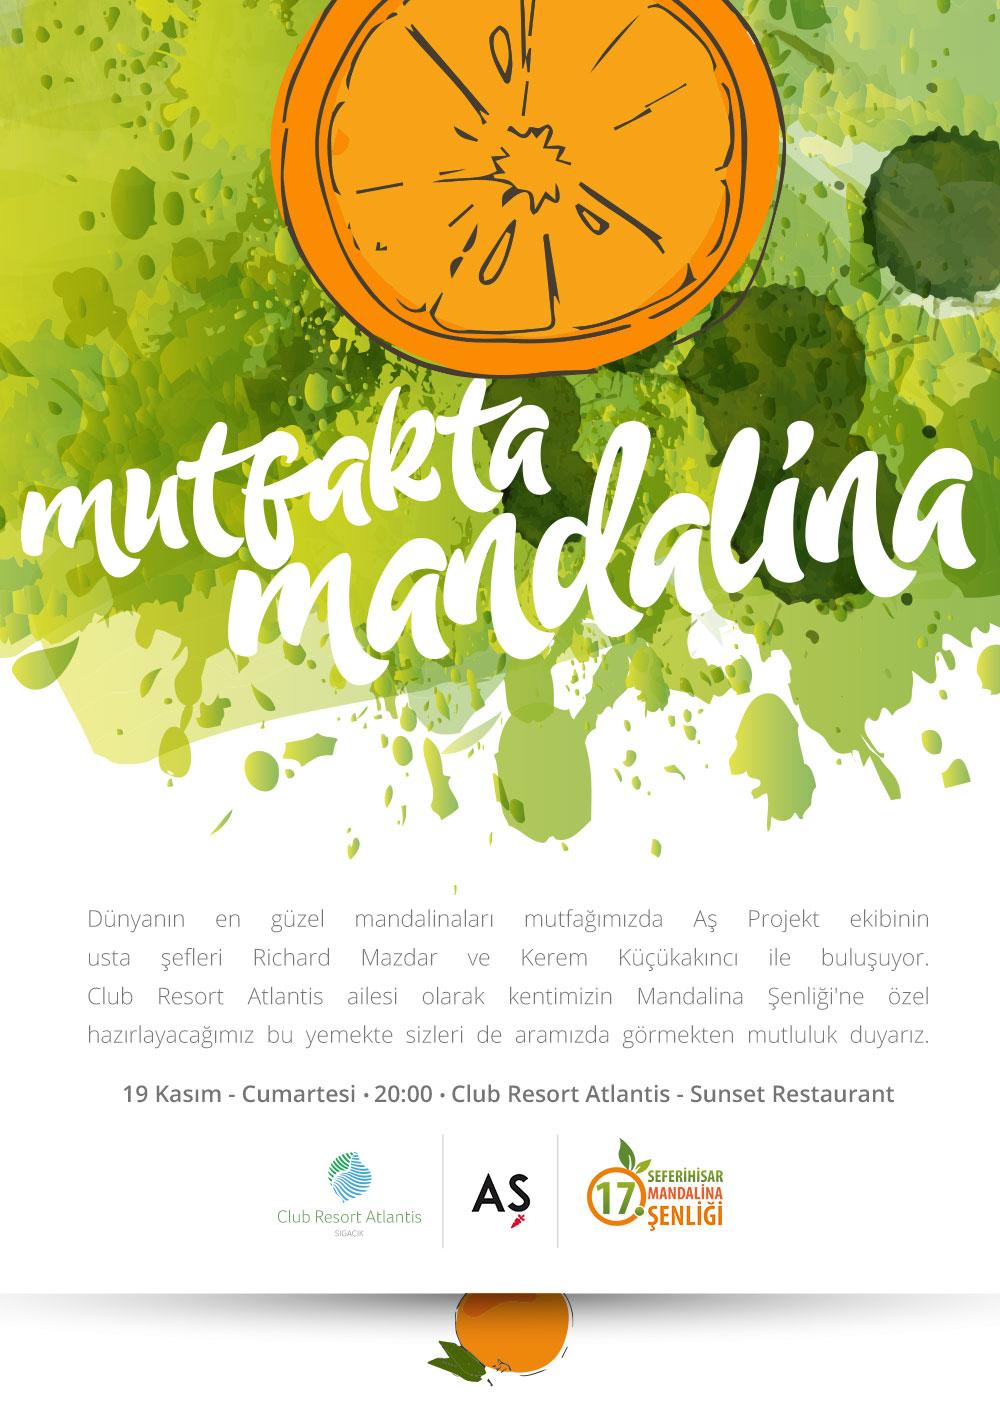 Mutfakta Mandalina